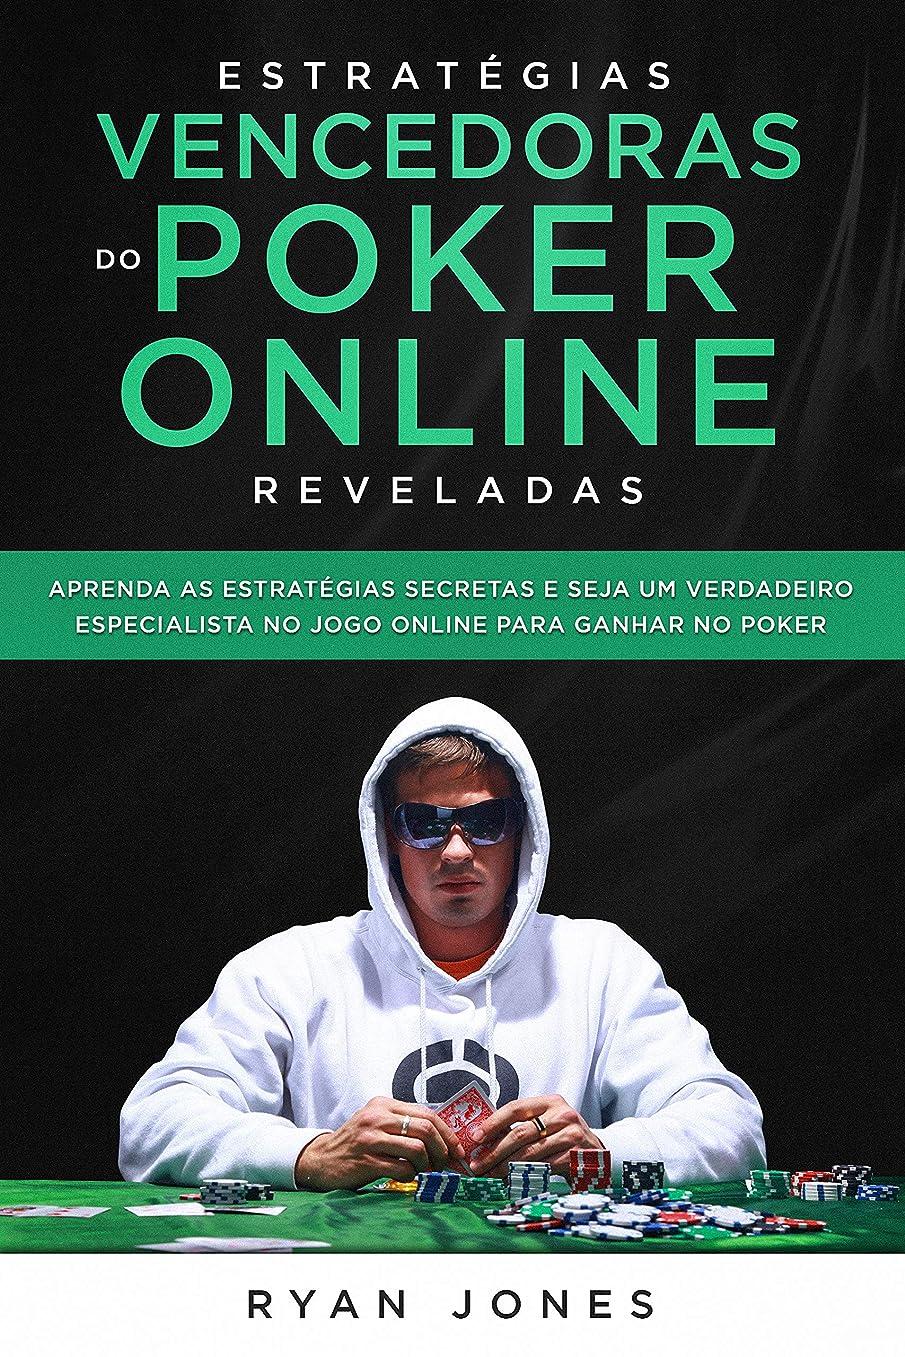 コンサルタント退屈九Estratégias Vencedoras do Poker Online Reveladas: Aprenda as Estratégias Secretas e Seja Um Verdadeiro Especialista No Jogo Online Para Ganhar No Poker (Portuguese Edition)